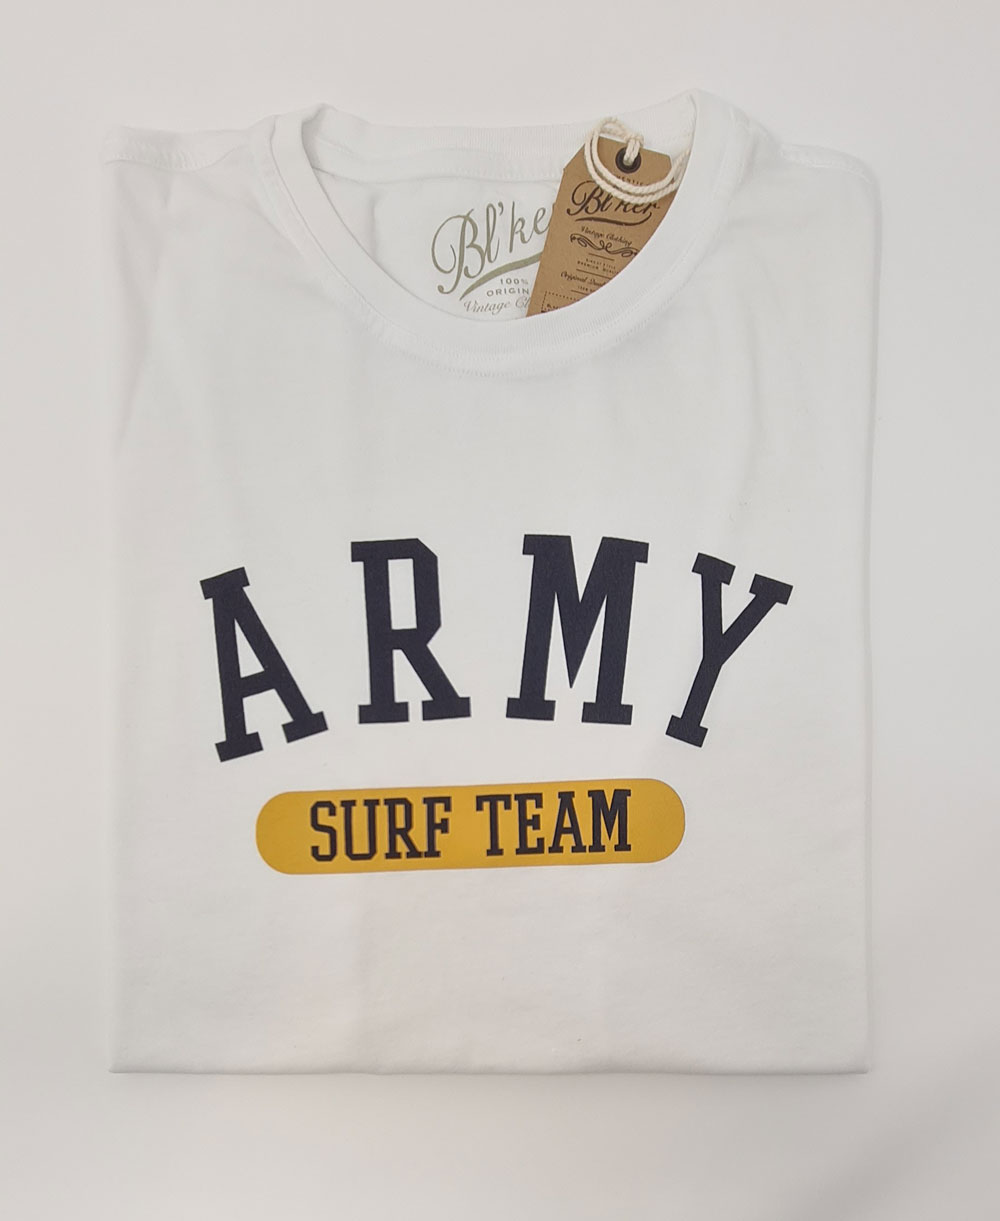 Army Surf Team Camiseta Manga Corta para Hombre White